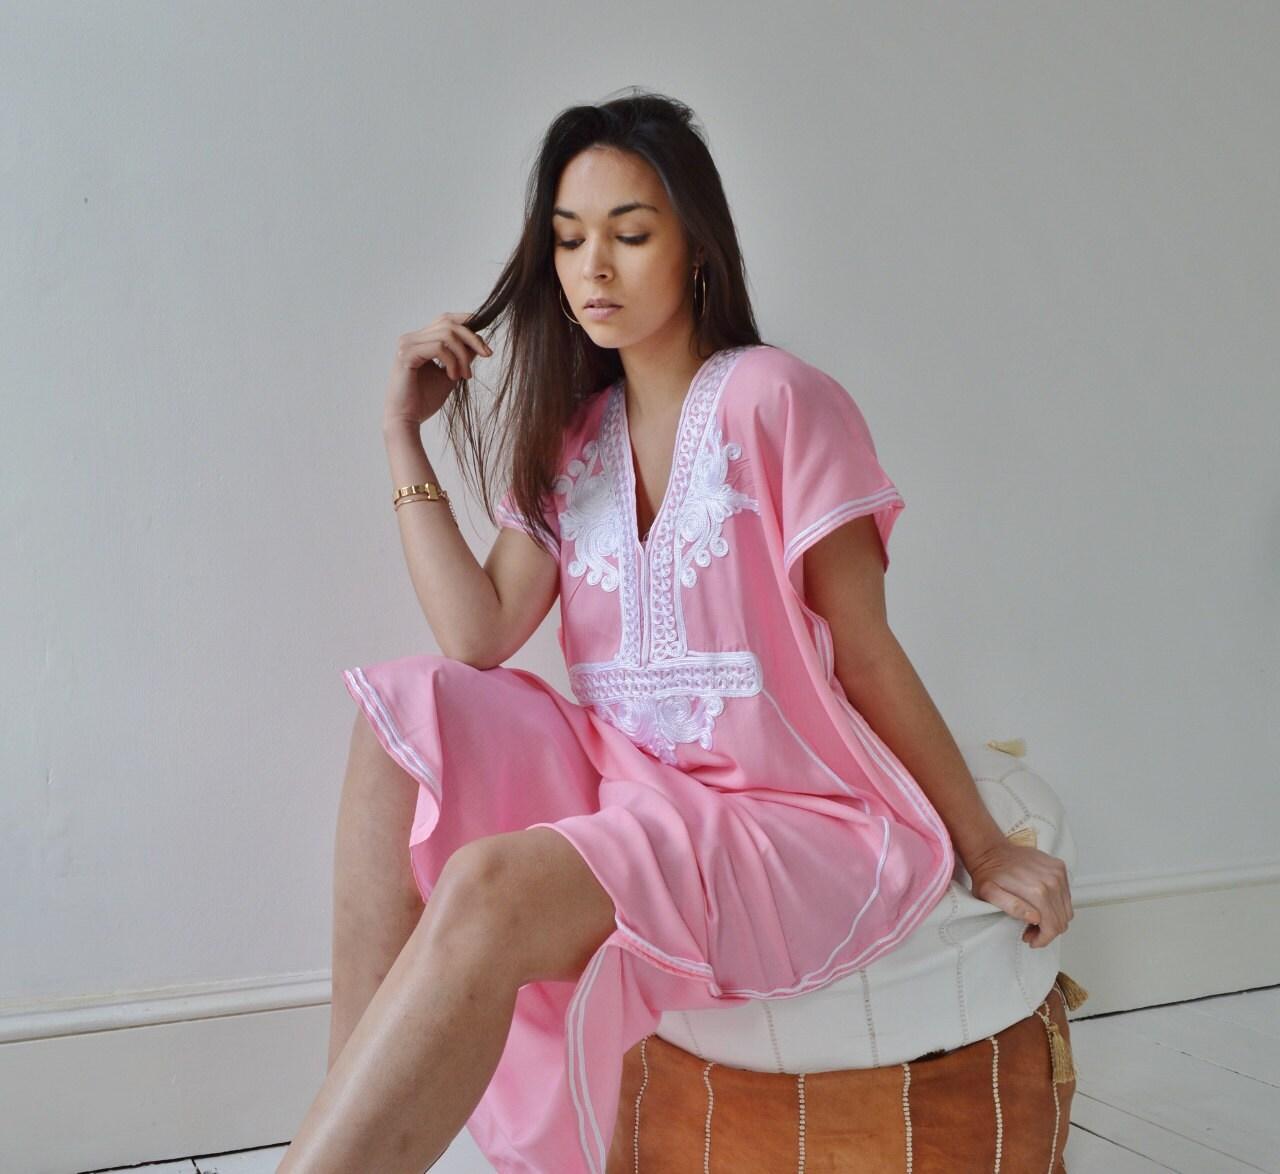 Pink with White Marrakech Resort Caftan Kaftan beach cover ups resortwearloungewear maxi dresses birthd